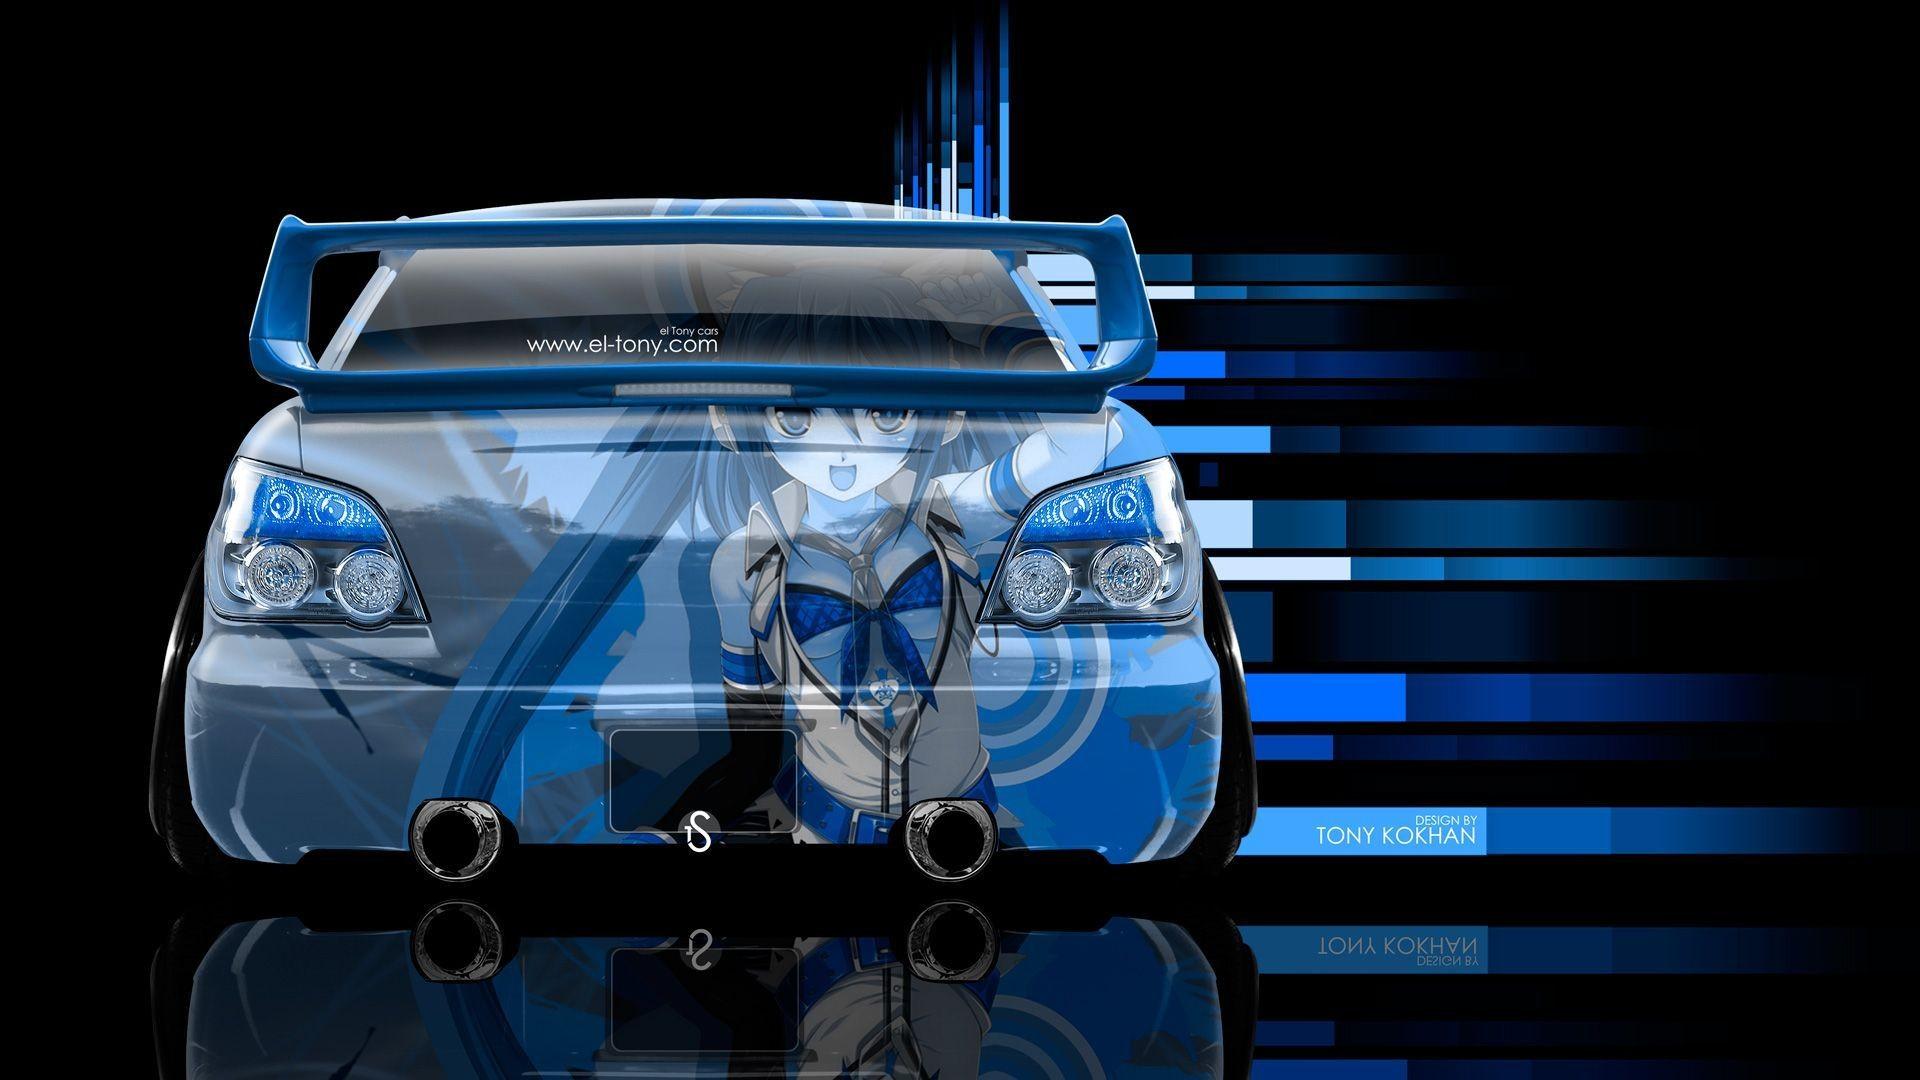 Subaru Impreza WRX STI JDM Back Anime Aerography Car 2014 Â« el Tony